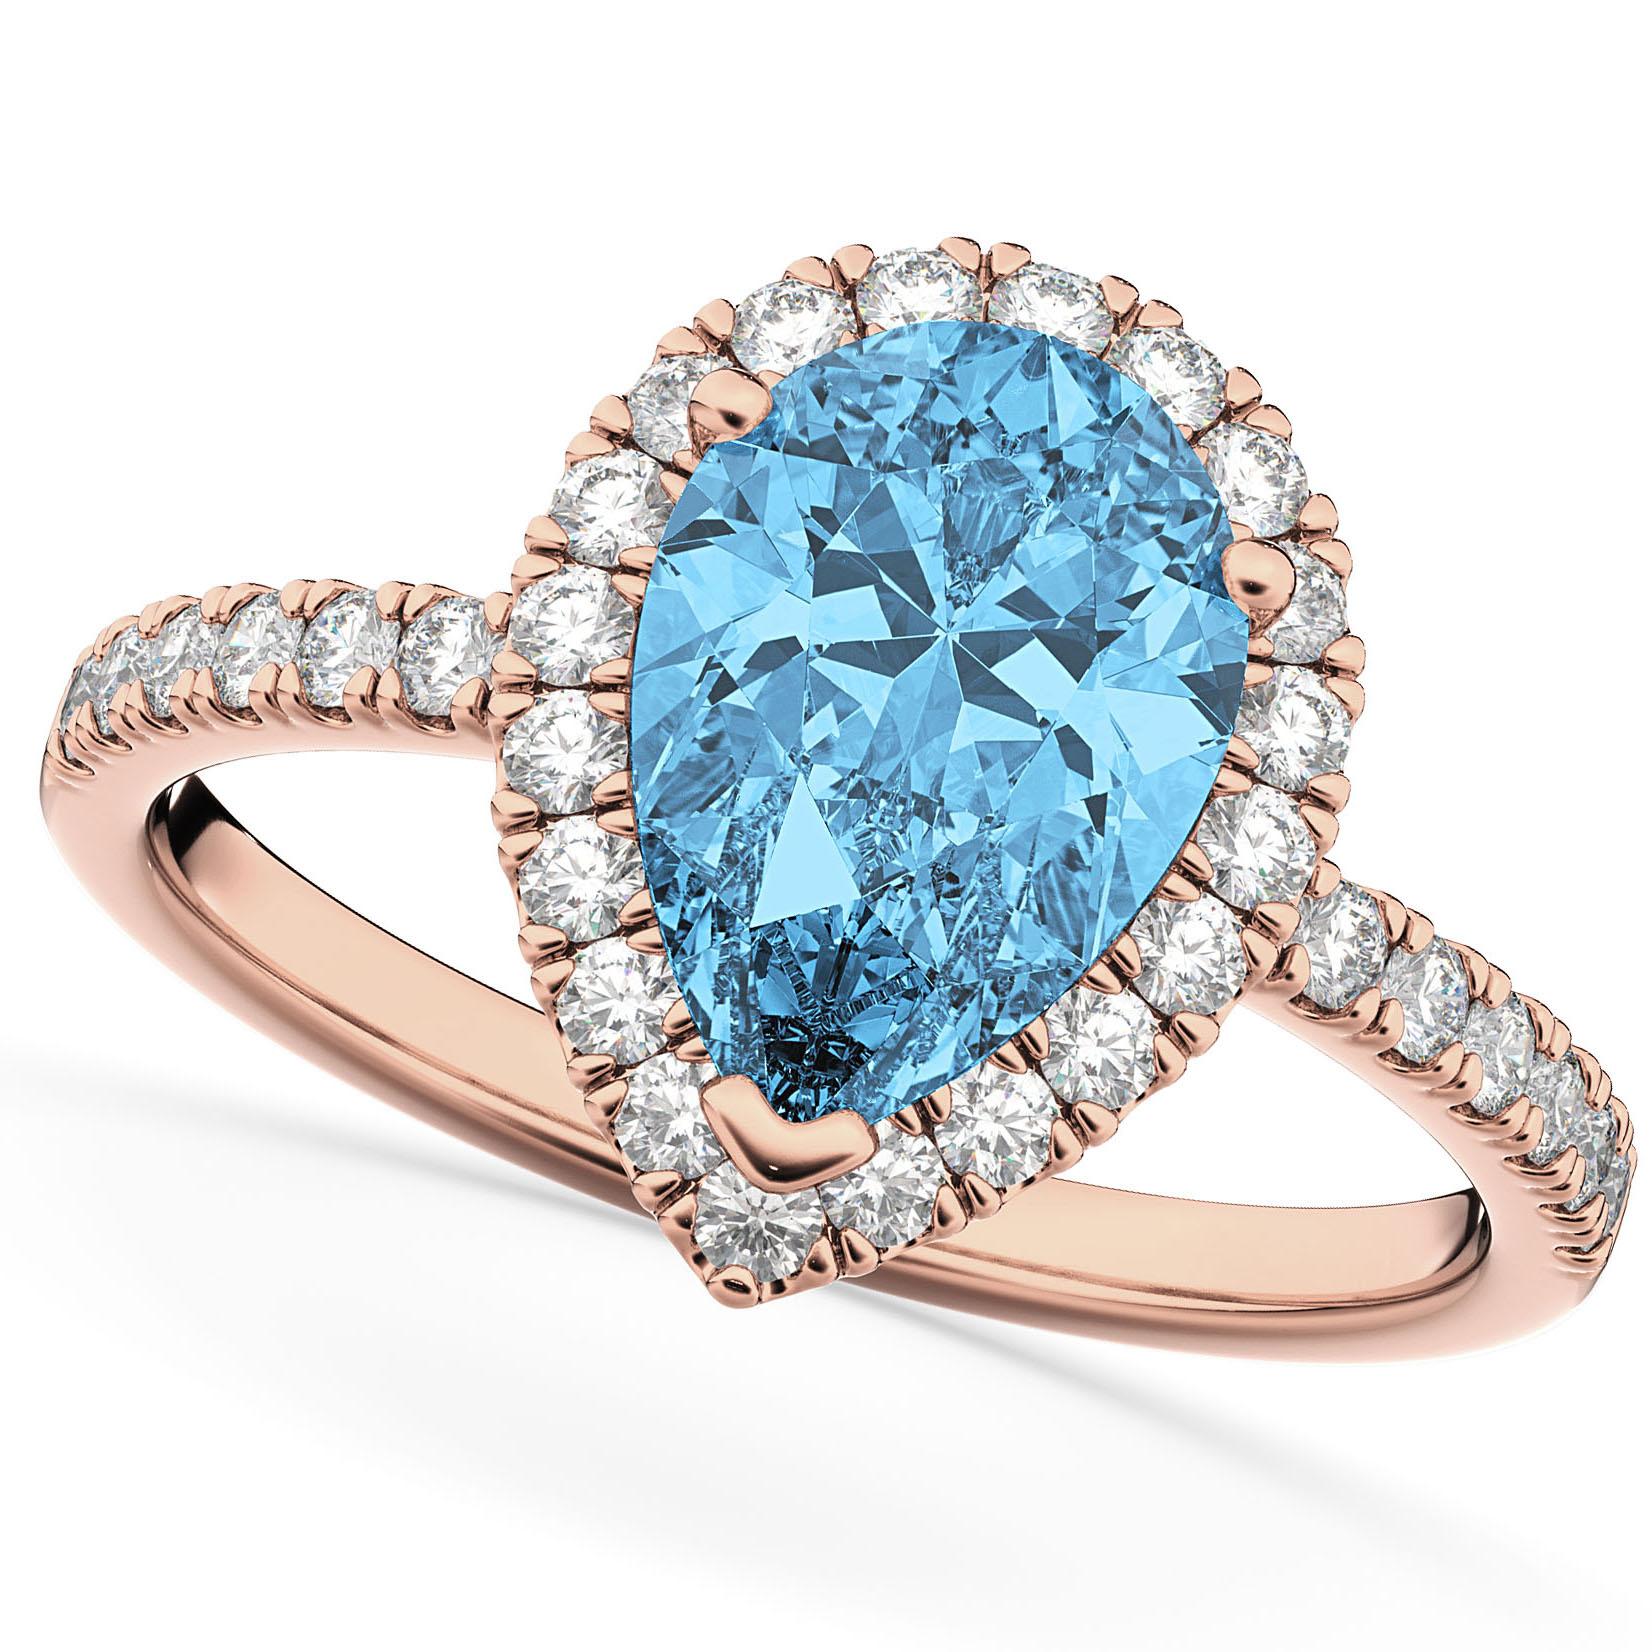 Pear Cut Halo Blue Topaz & Diamond Engagement Ring 14K Rose Gold 1.91ct